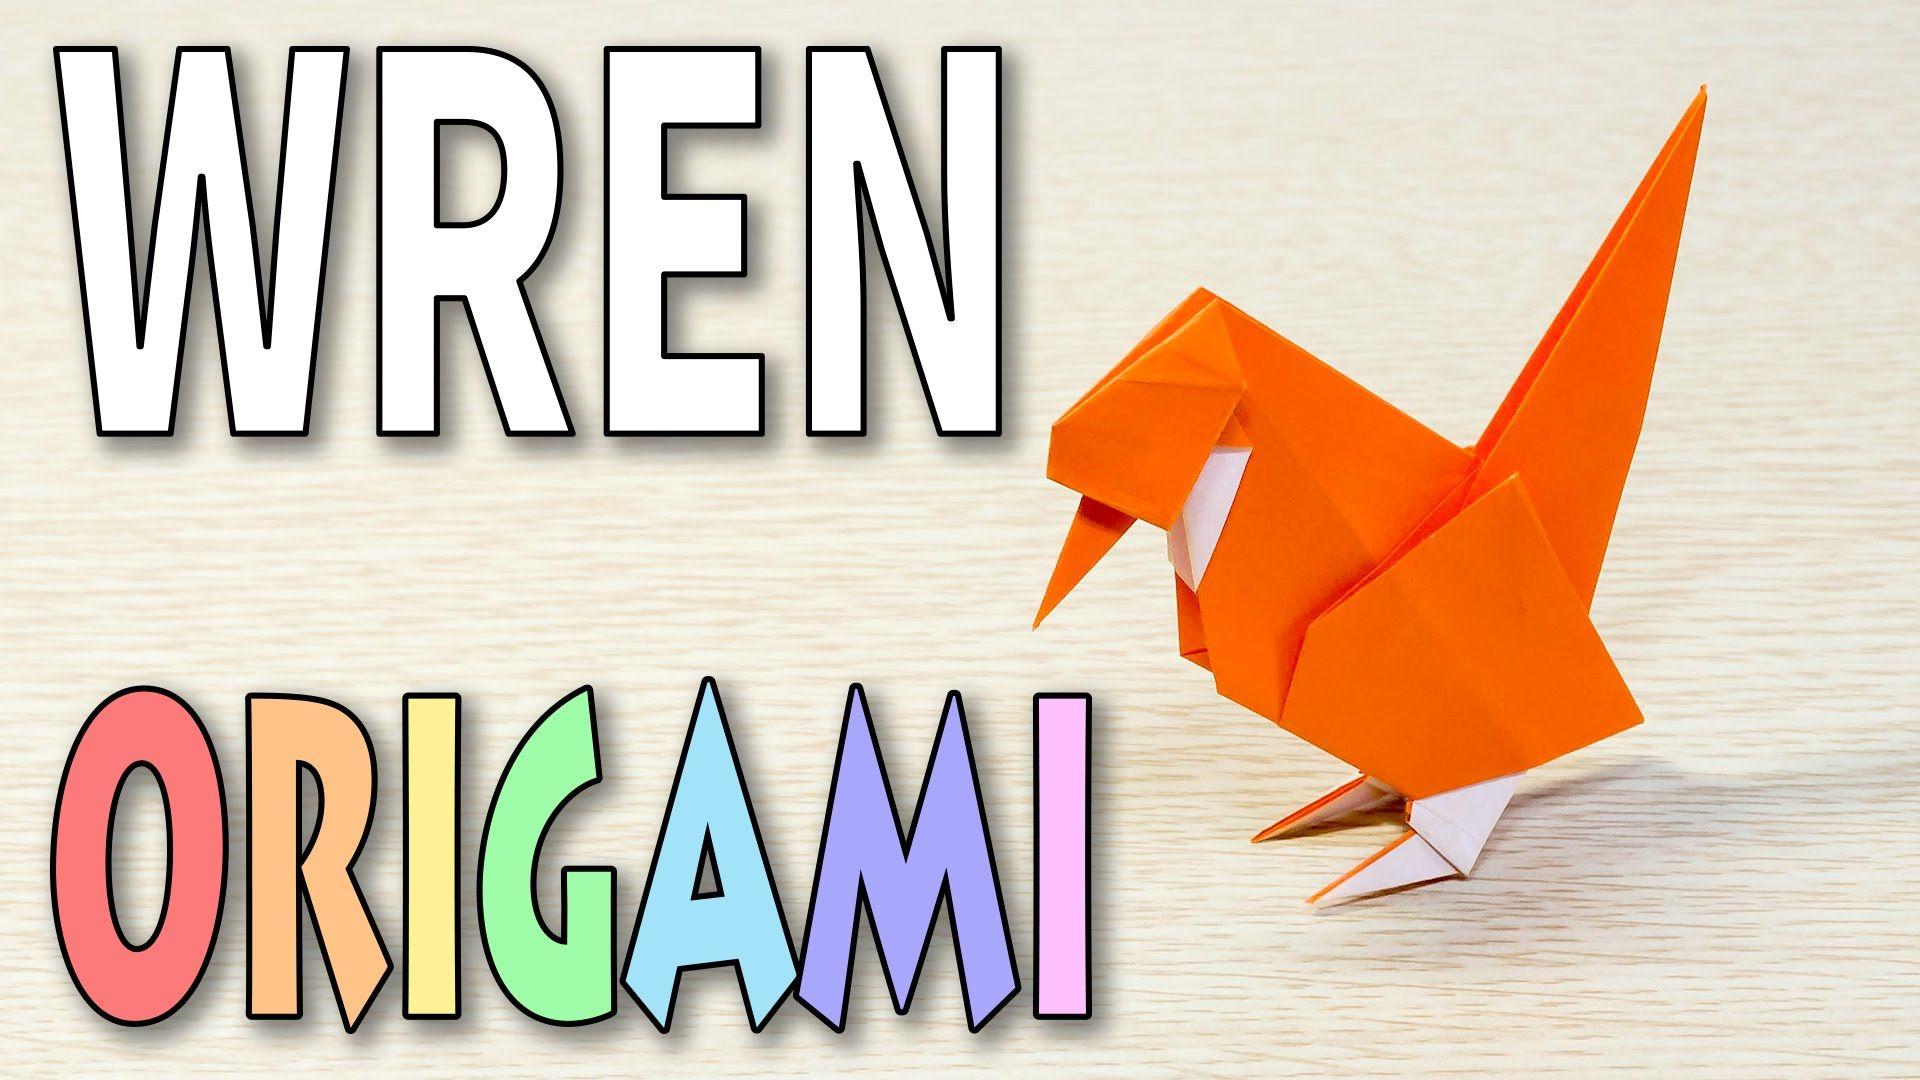 Origami Bird : A WREN | ORIGAMI TUTORIALS 3 | Paper crafts